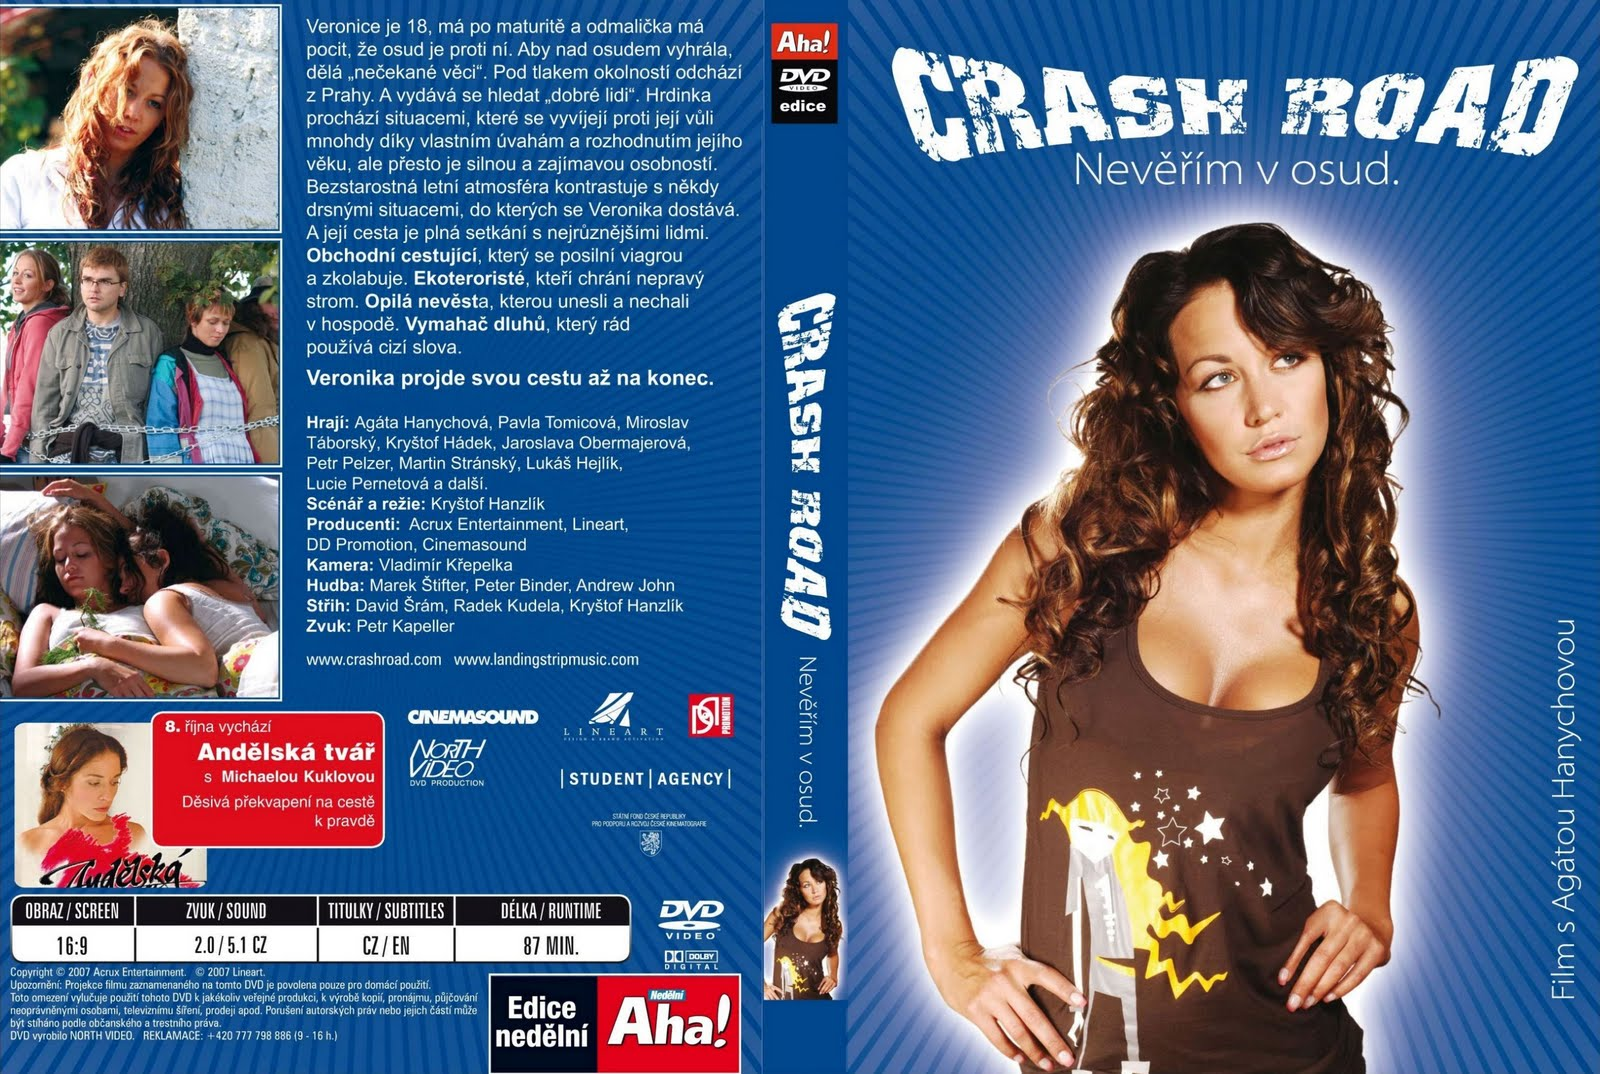 http://1.bp.blogspot.com/-t7E8riSIXDE/TfTPdOFyDfI/AAAAAAAAbUg/DdTN3xsT7go/s1600/Crash_road.jpg